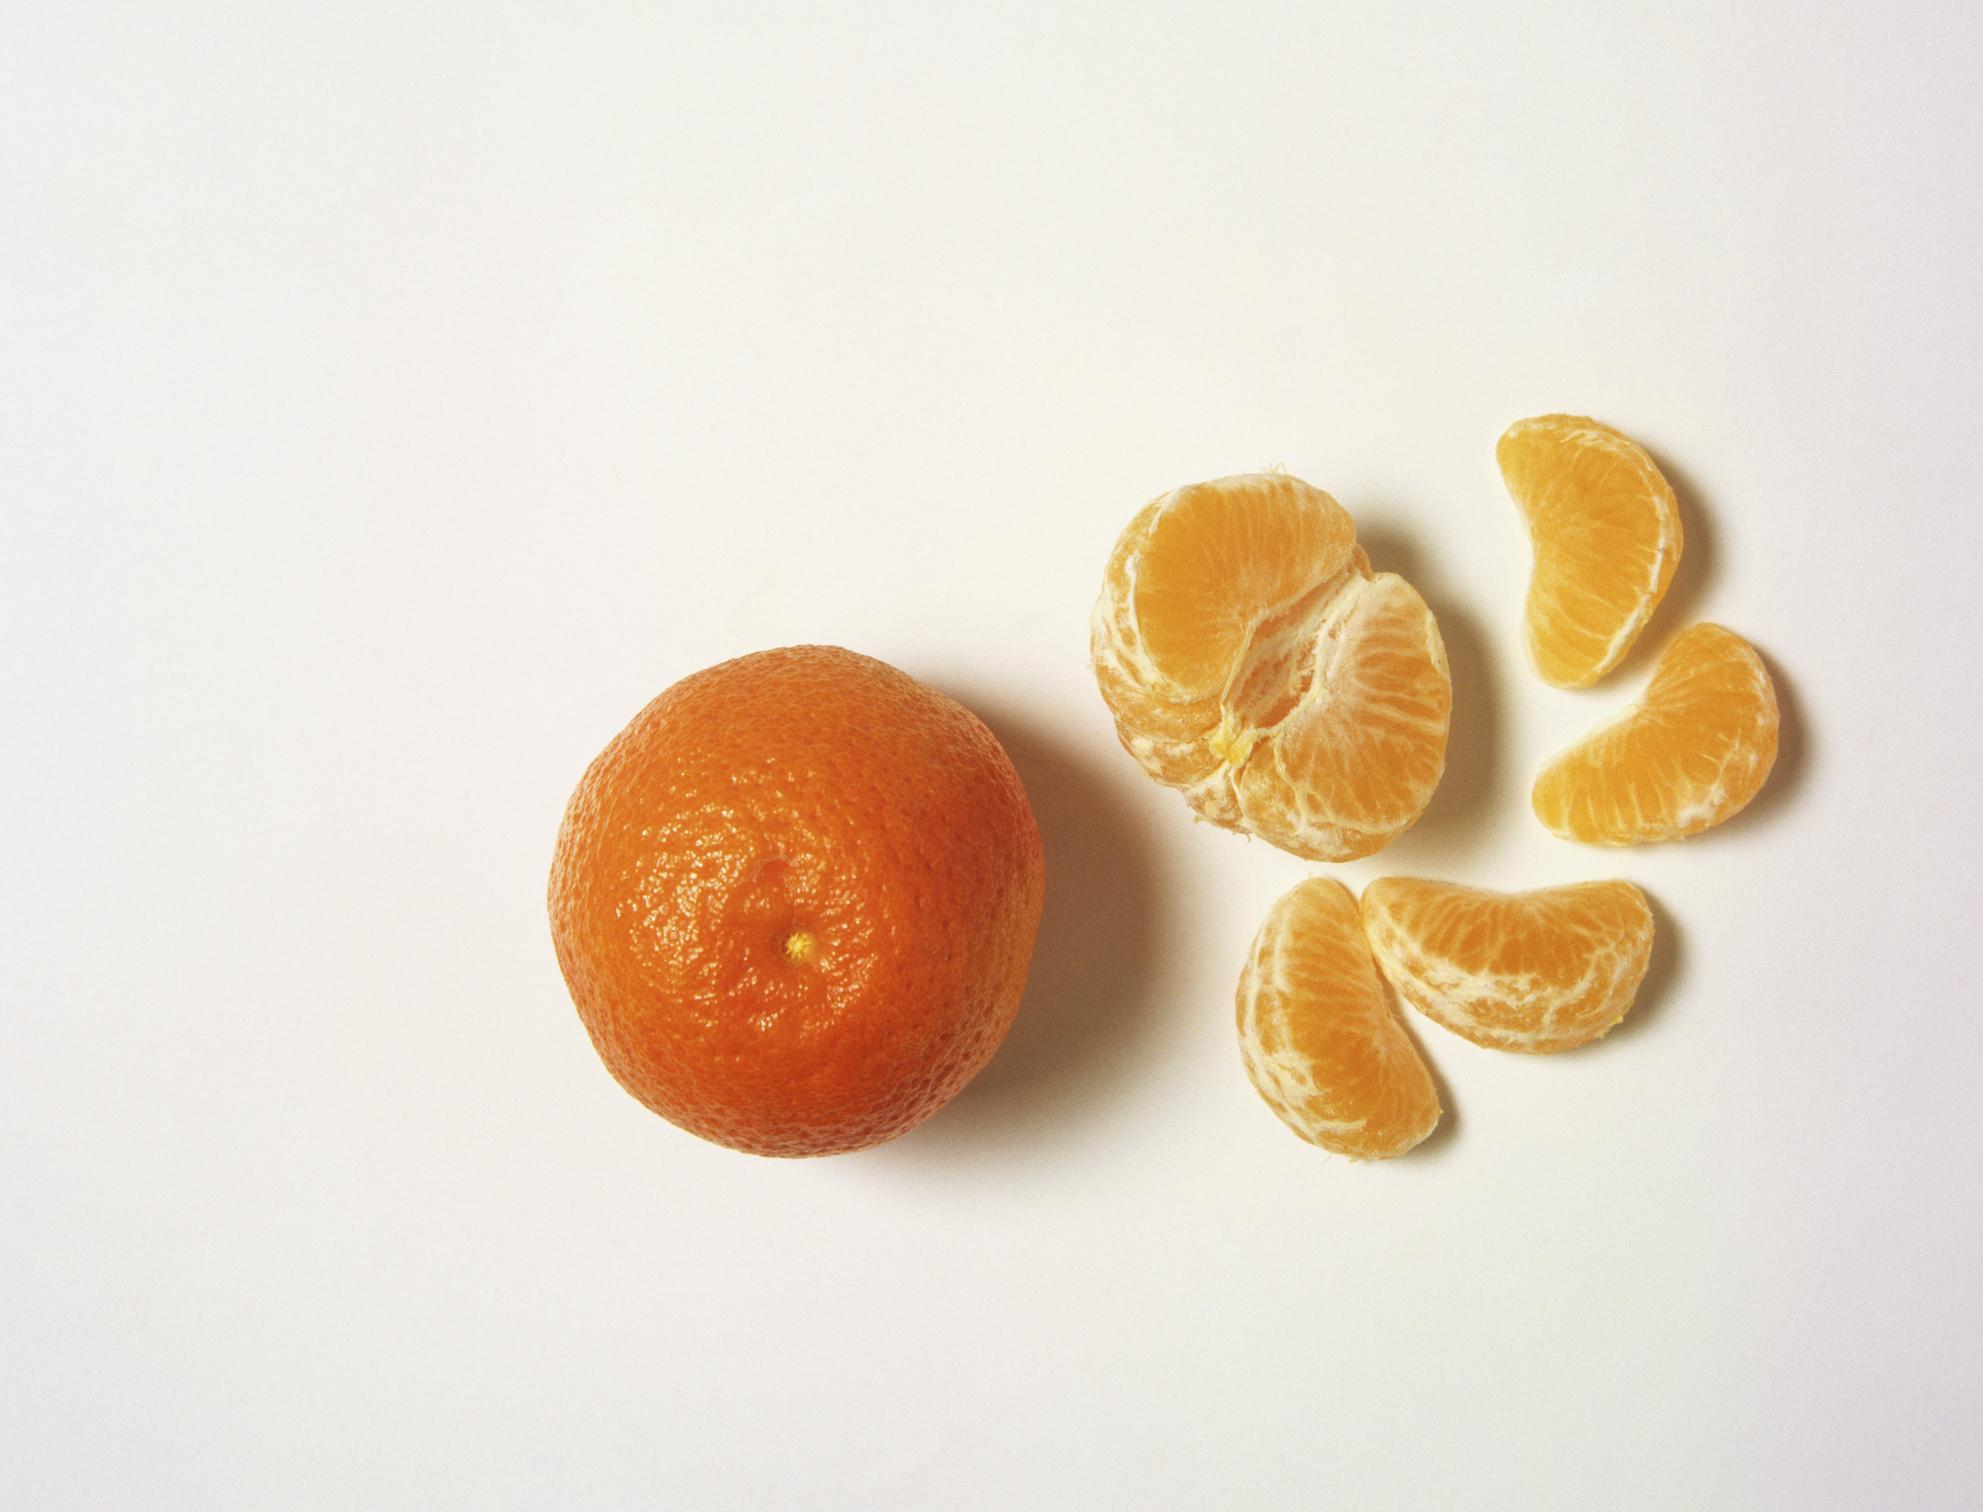 Clementine image